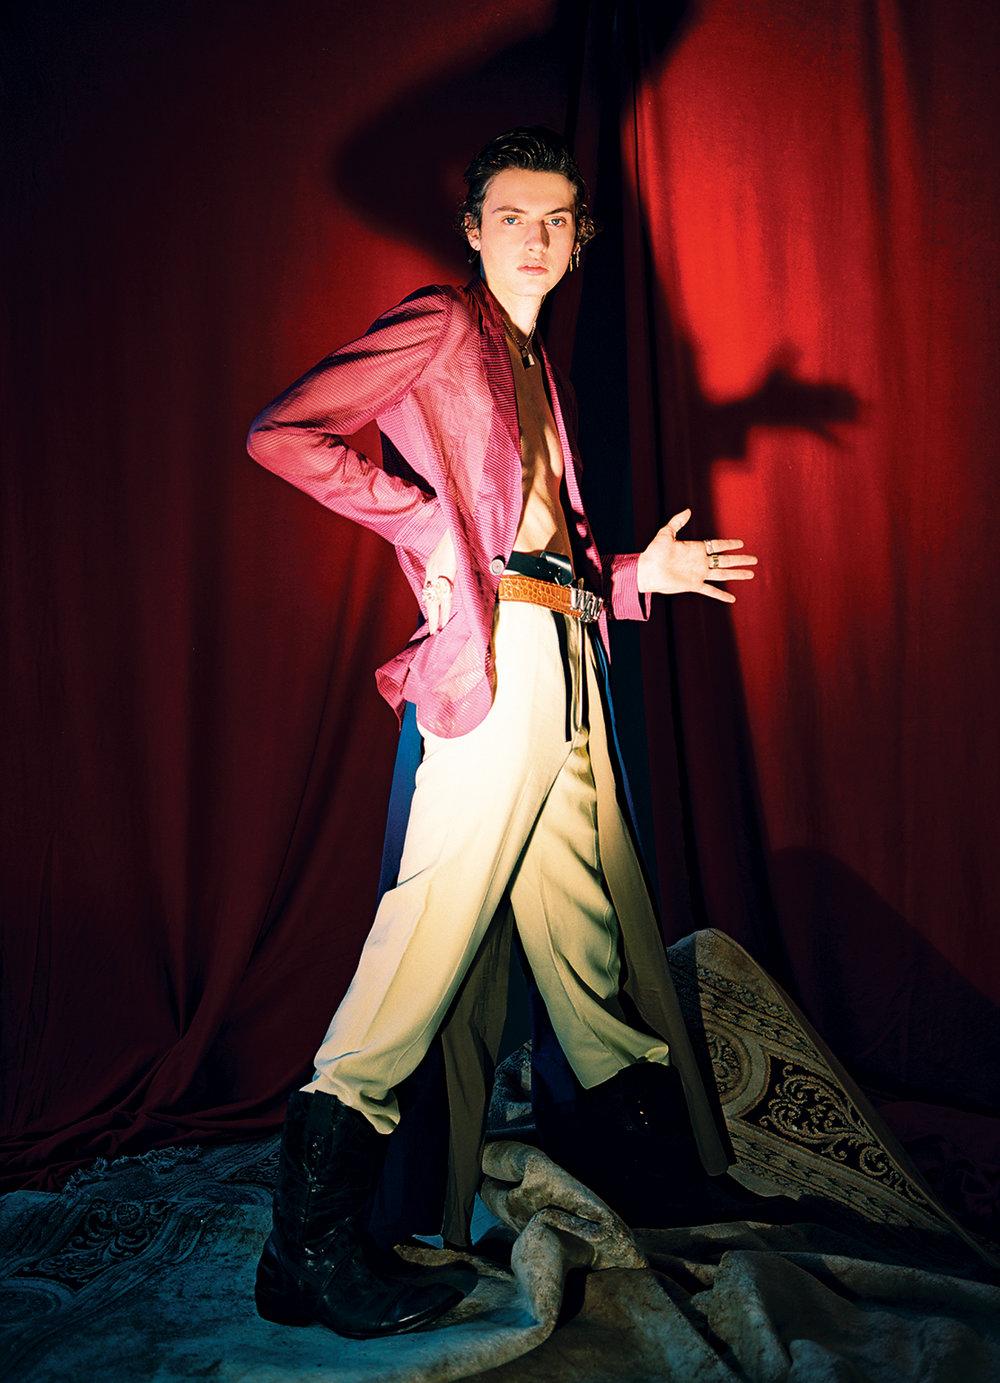 Jacket  PRABAL GURUNG  Trousers  GUCCI  Shoes  Frye Miles Vintage